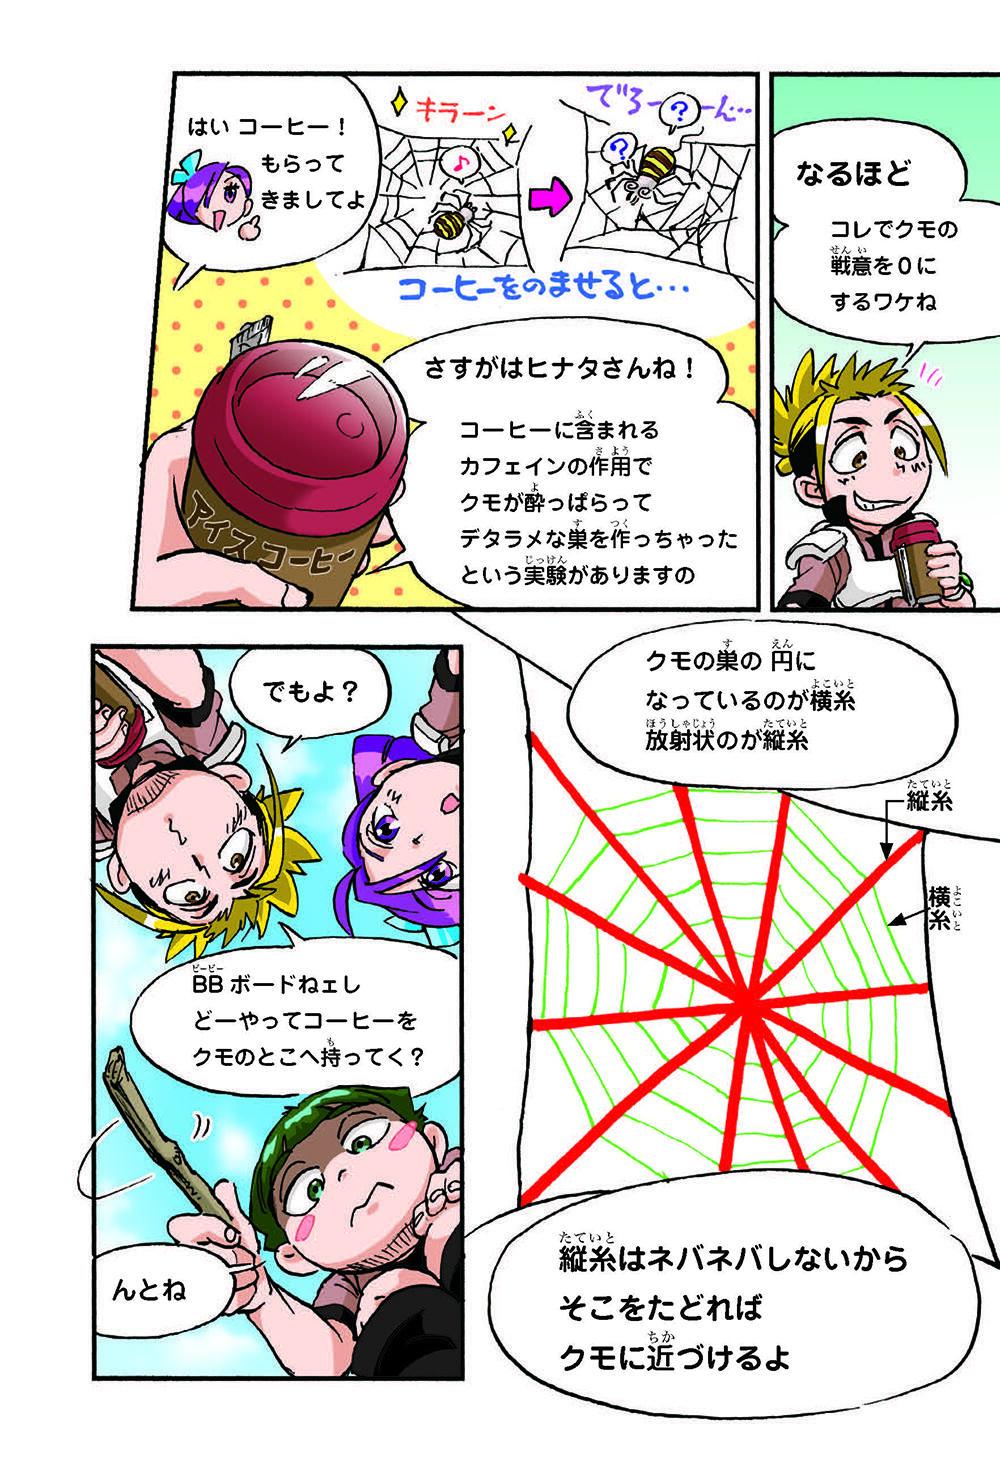 BB_蜊ア髯コ逕溽黄_繝倥z繝シ繧キ繧兩143.jpg